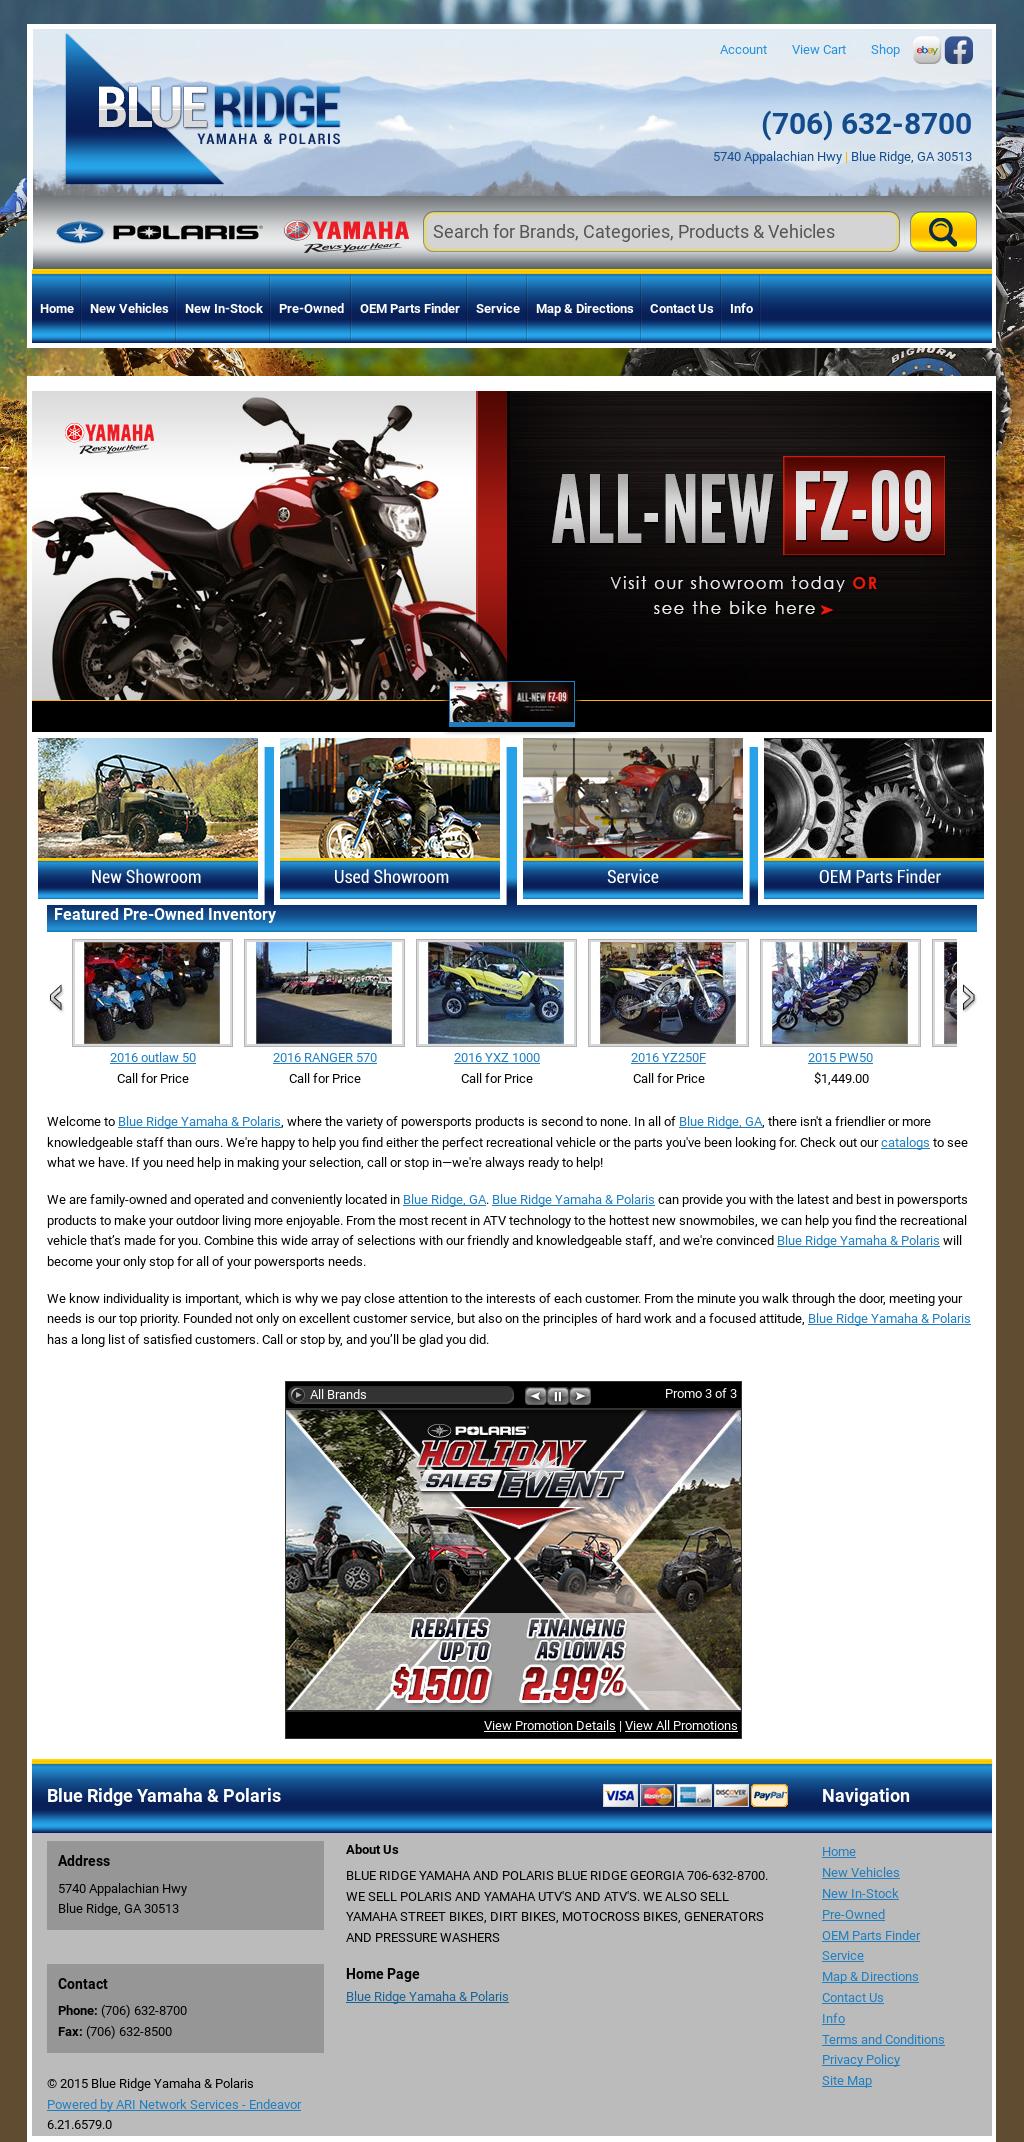 Blue Ridge Yamaha Competitors, Revenue and Employees - Owler